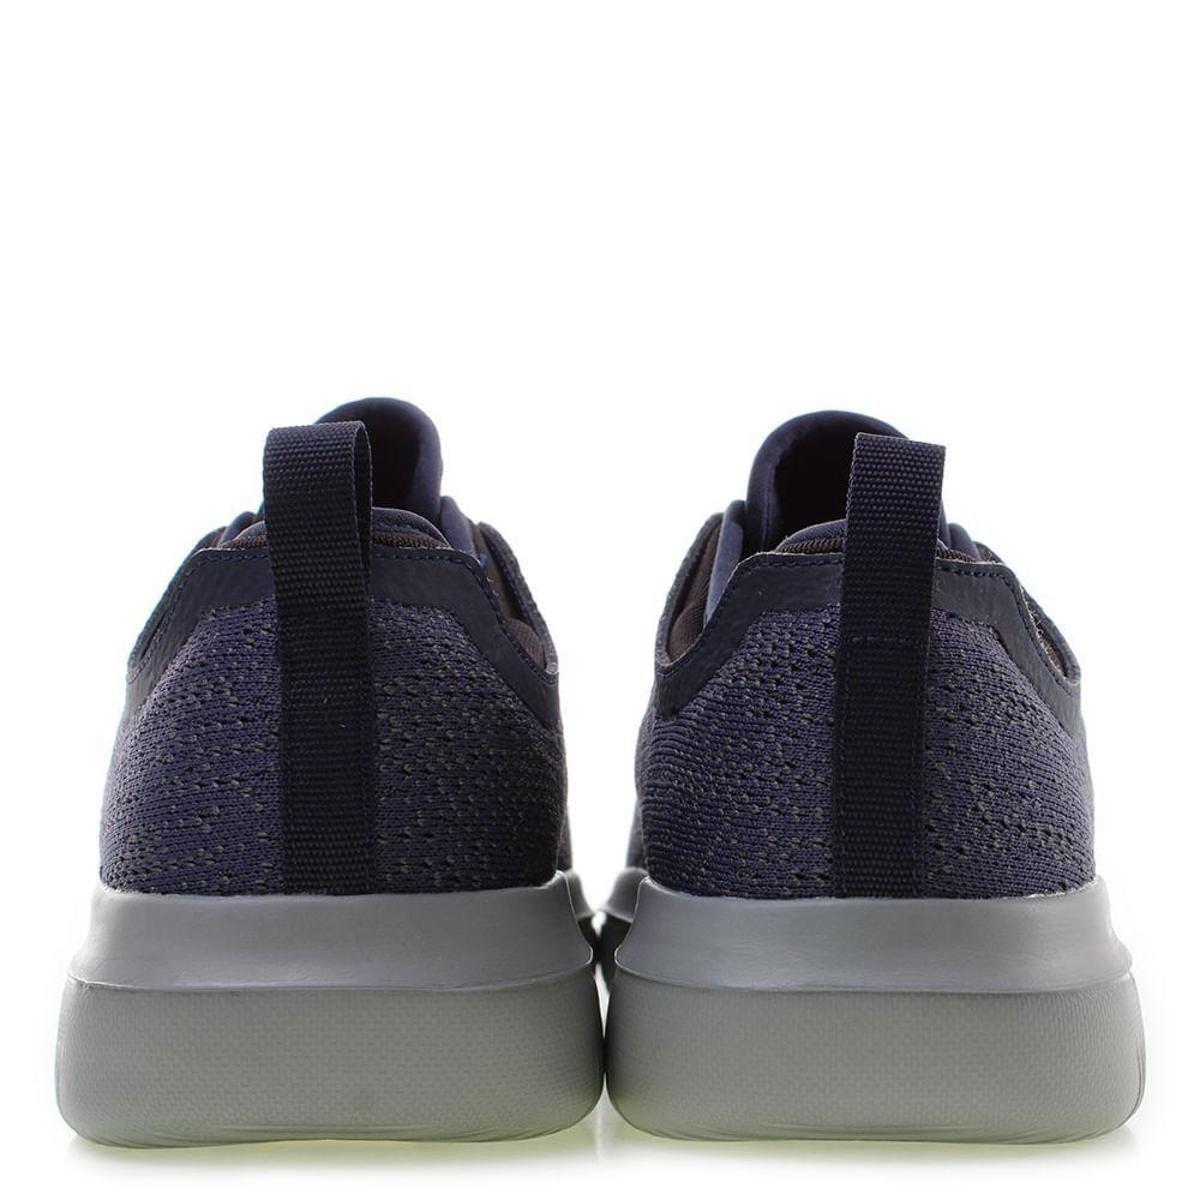 Tênis Skechers Go Walk Evolution Ultra Logic azul/cinza